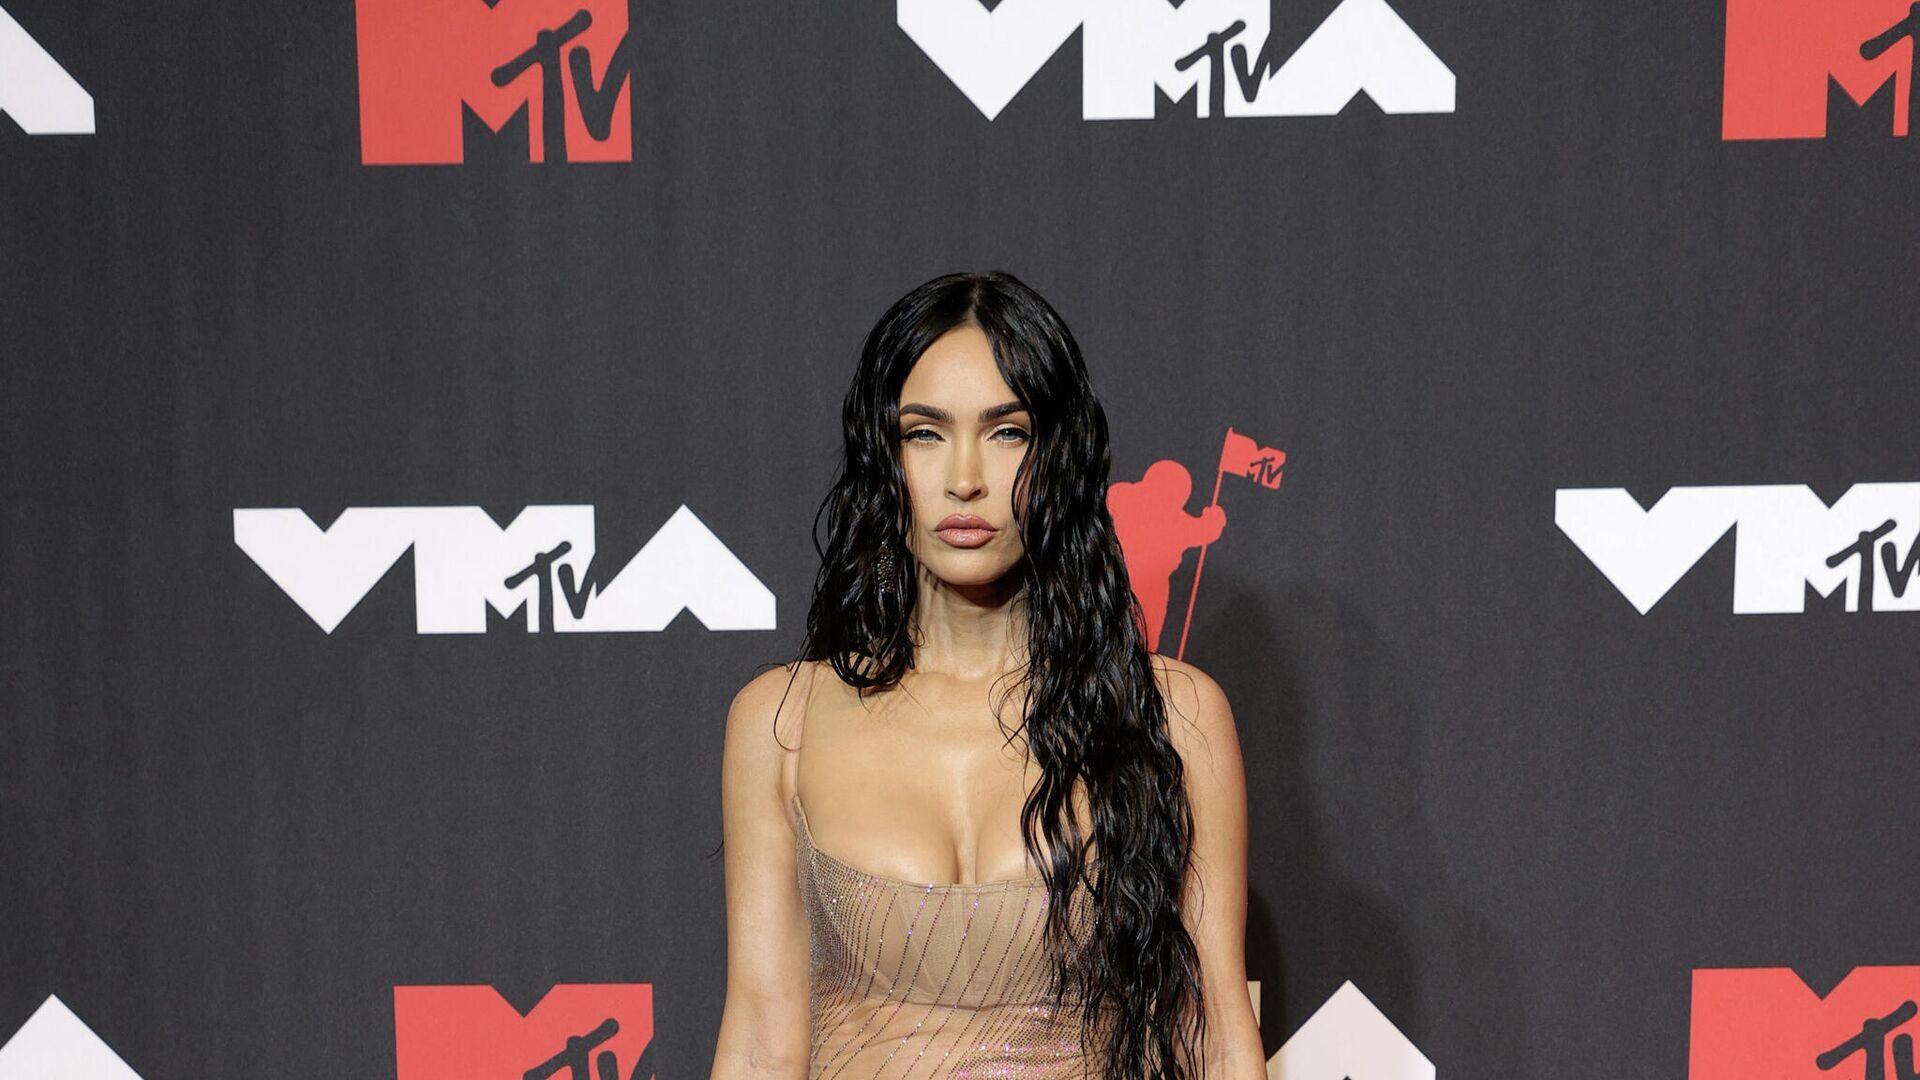 Меган Фокс на церемонии вручения премии MTV Video Music Awards 2021 - Sputnik Таджикистан, 1920, 13.09.2021